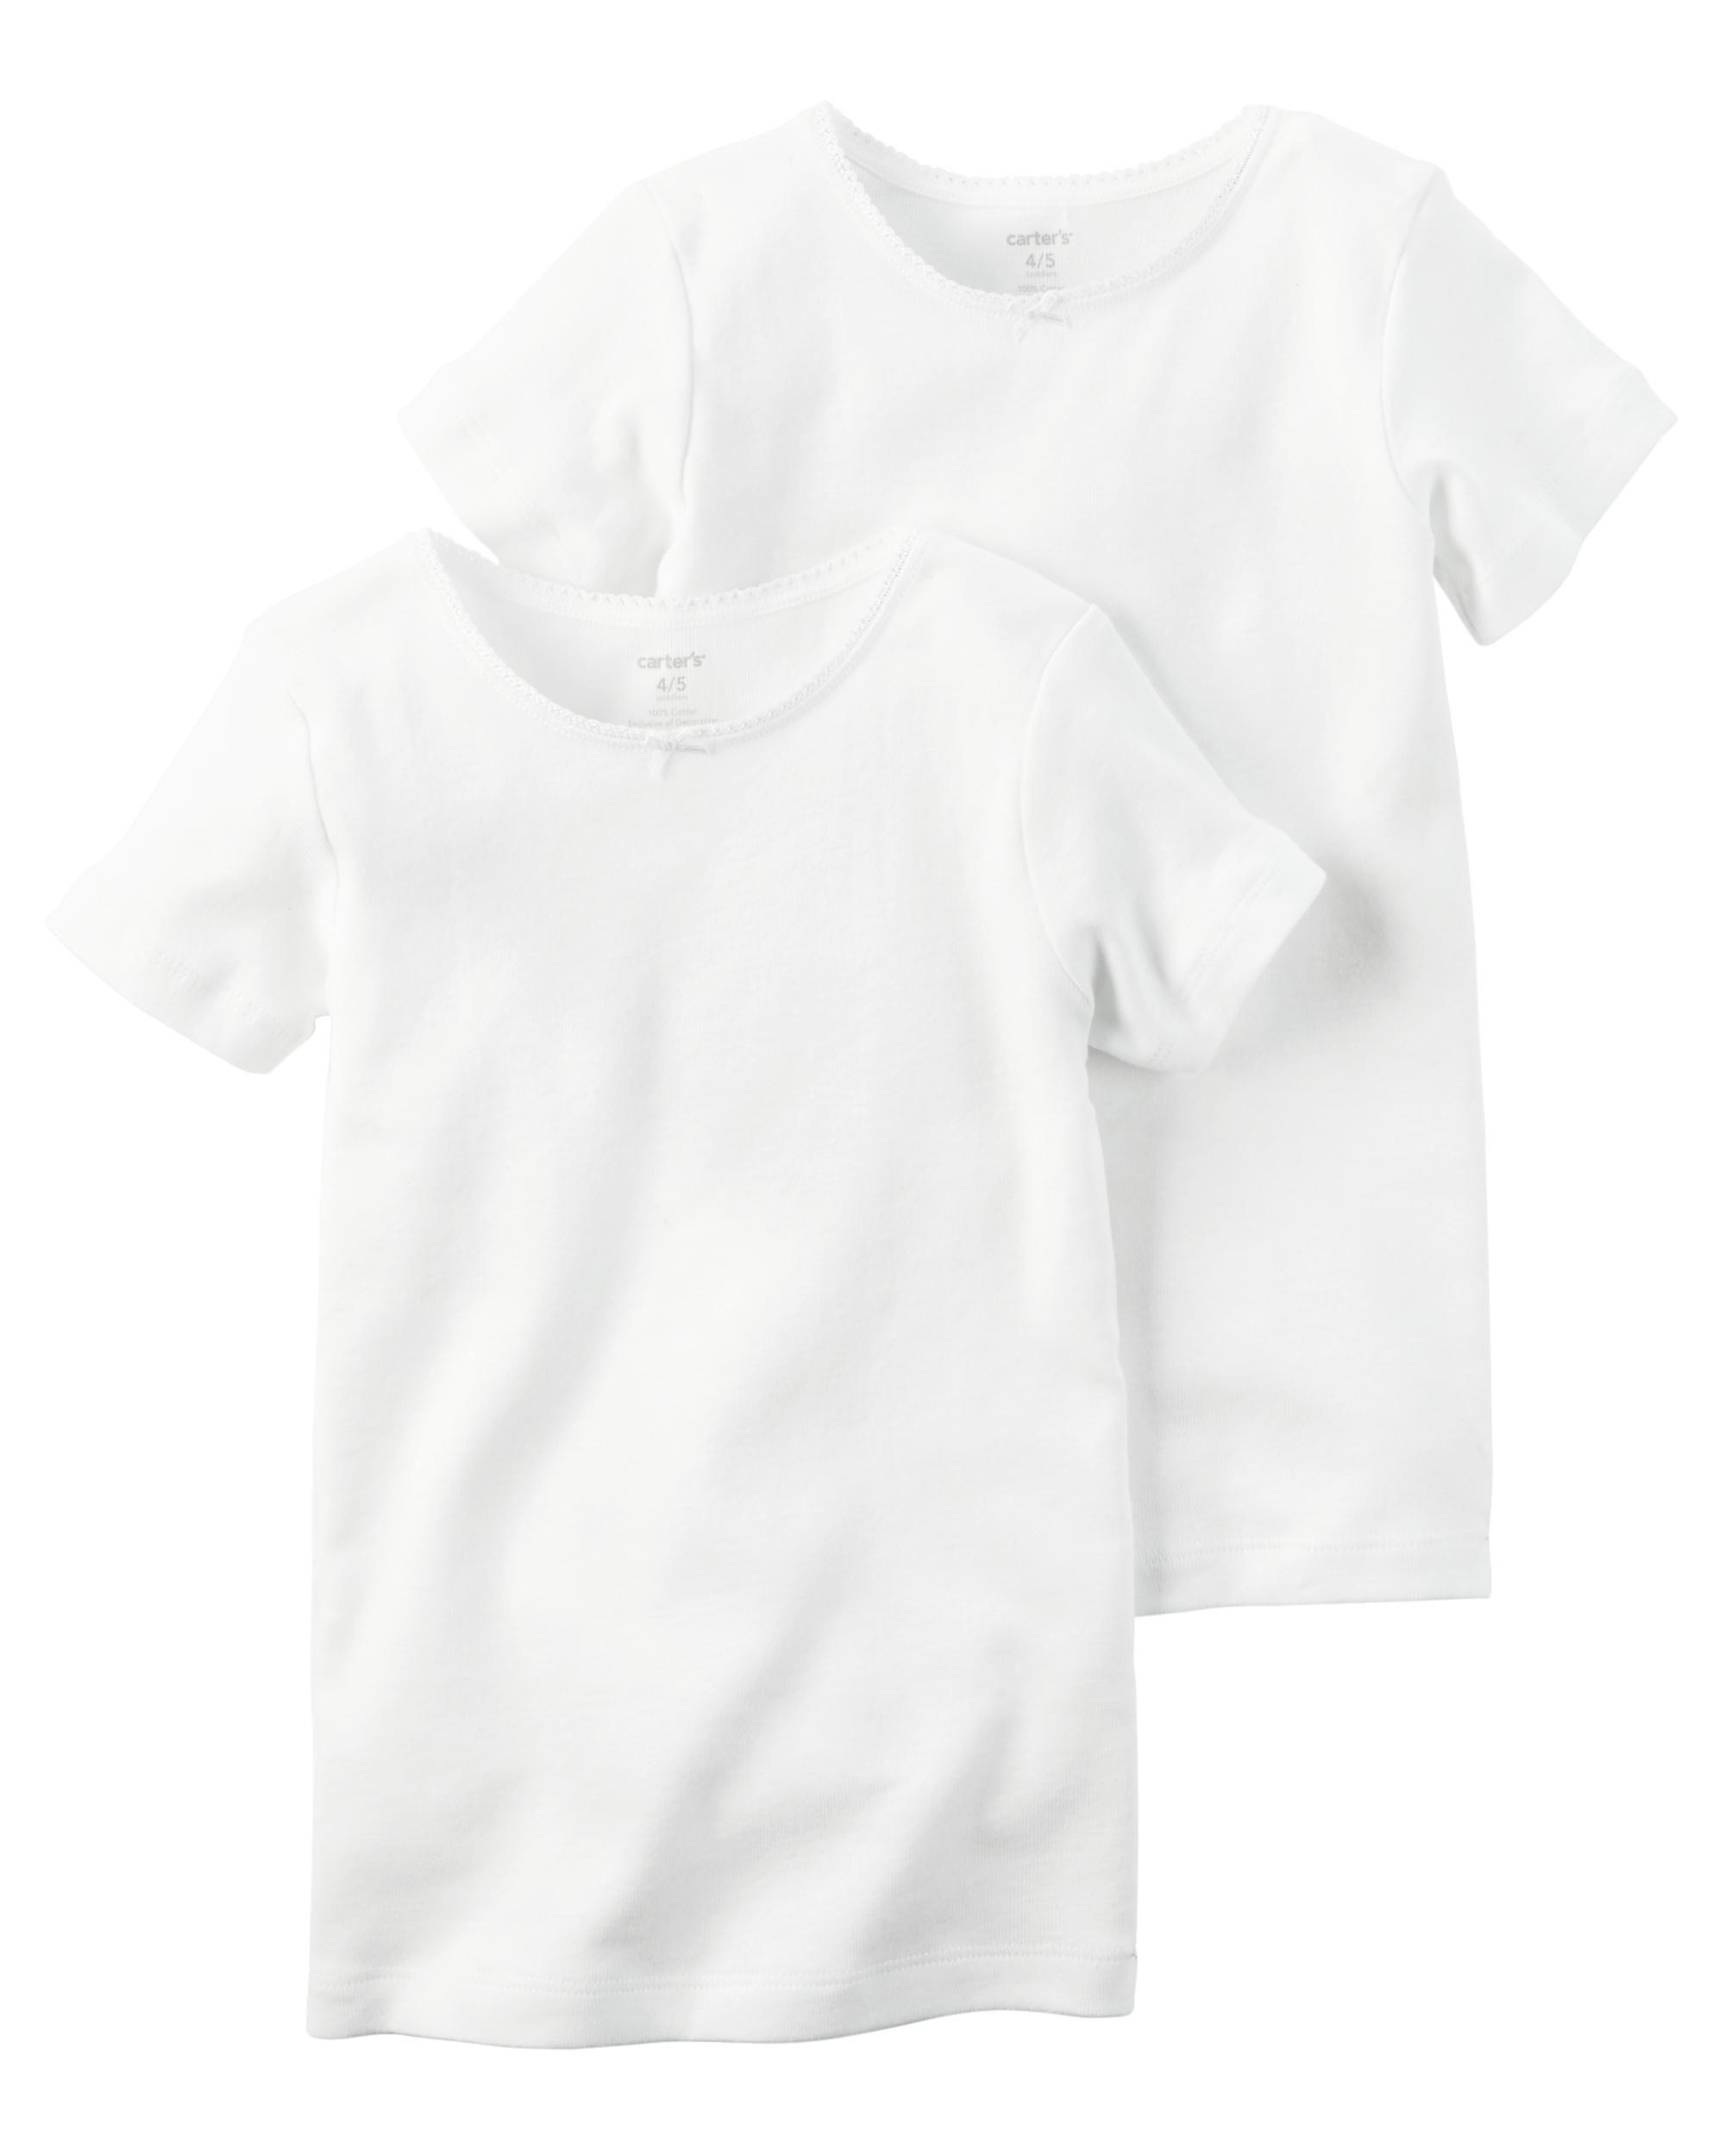 2000x2500 2 Pack Cotton Undershirts